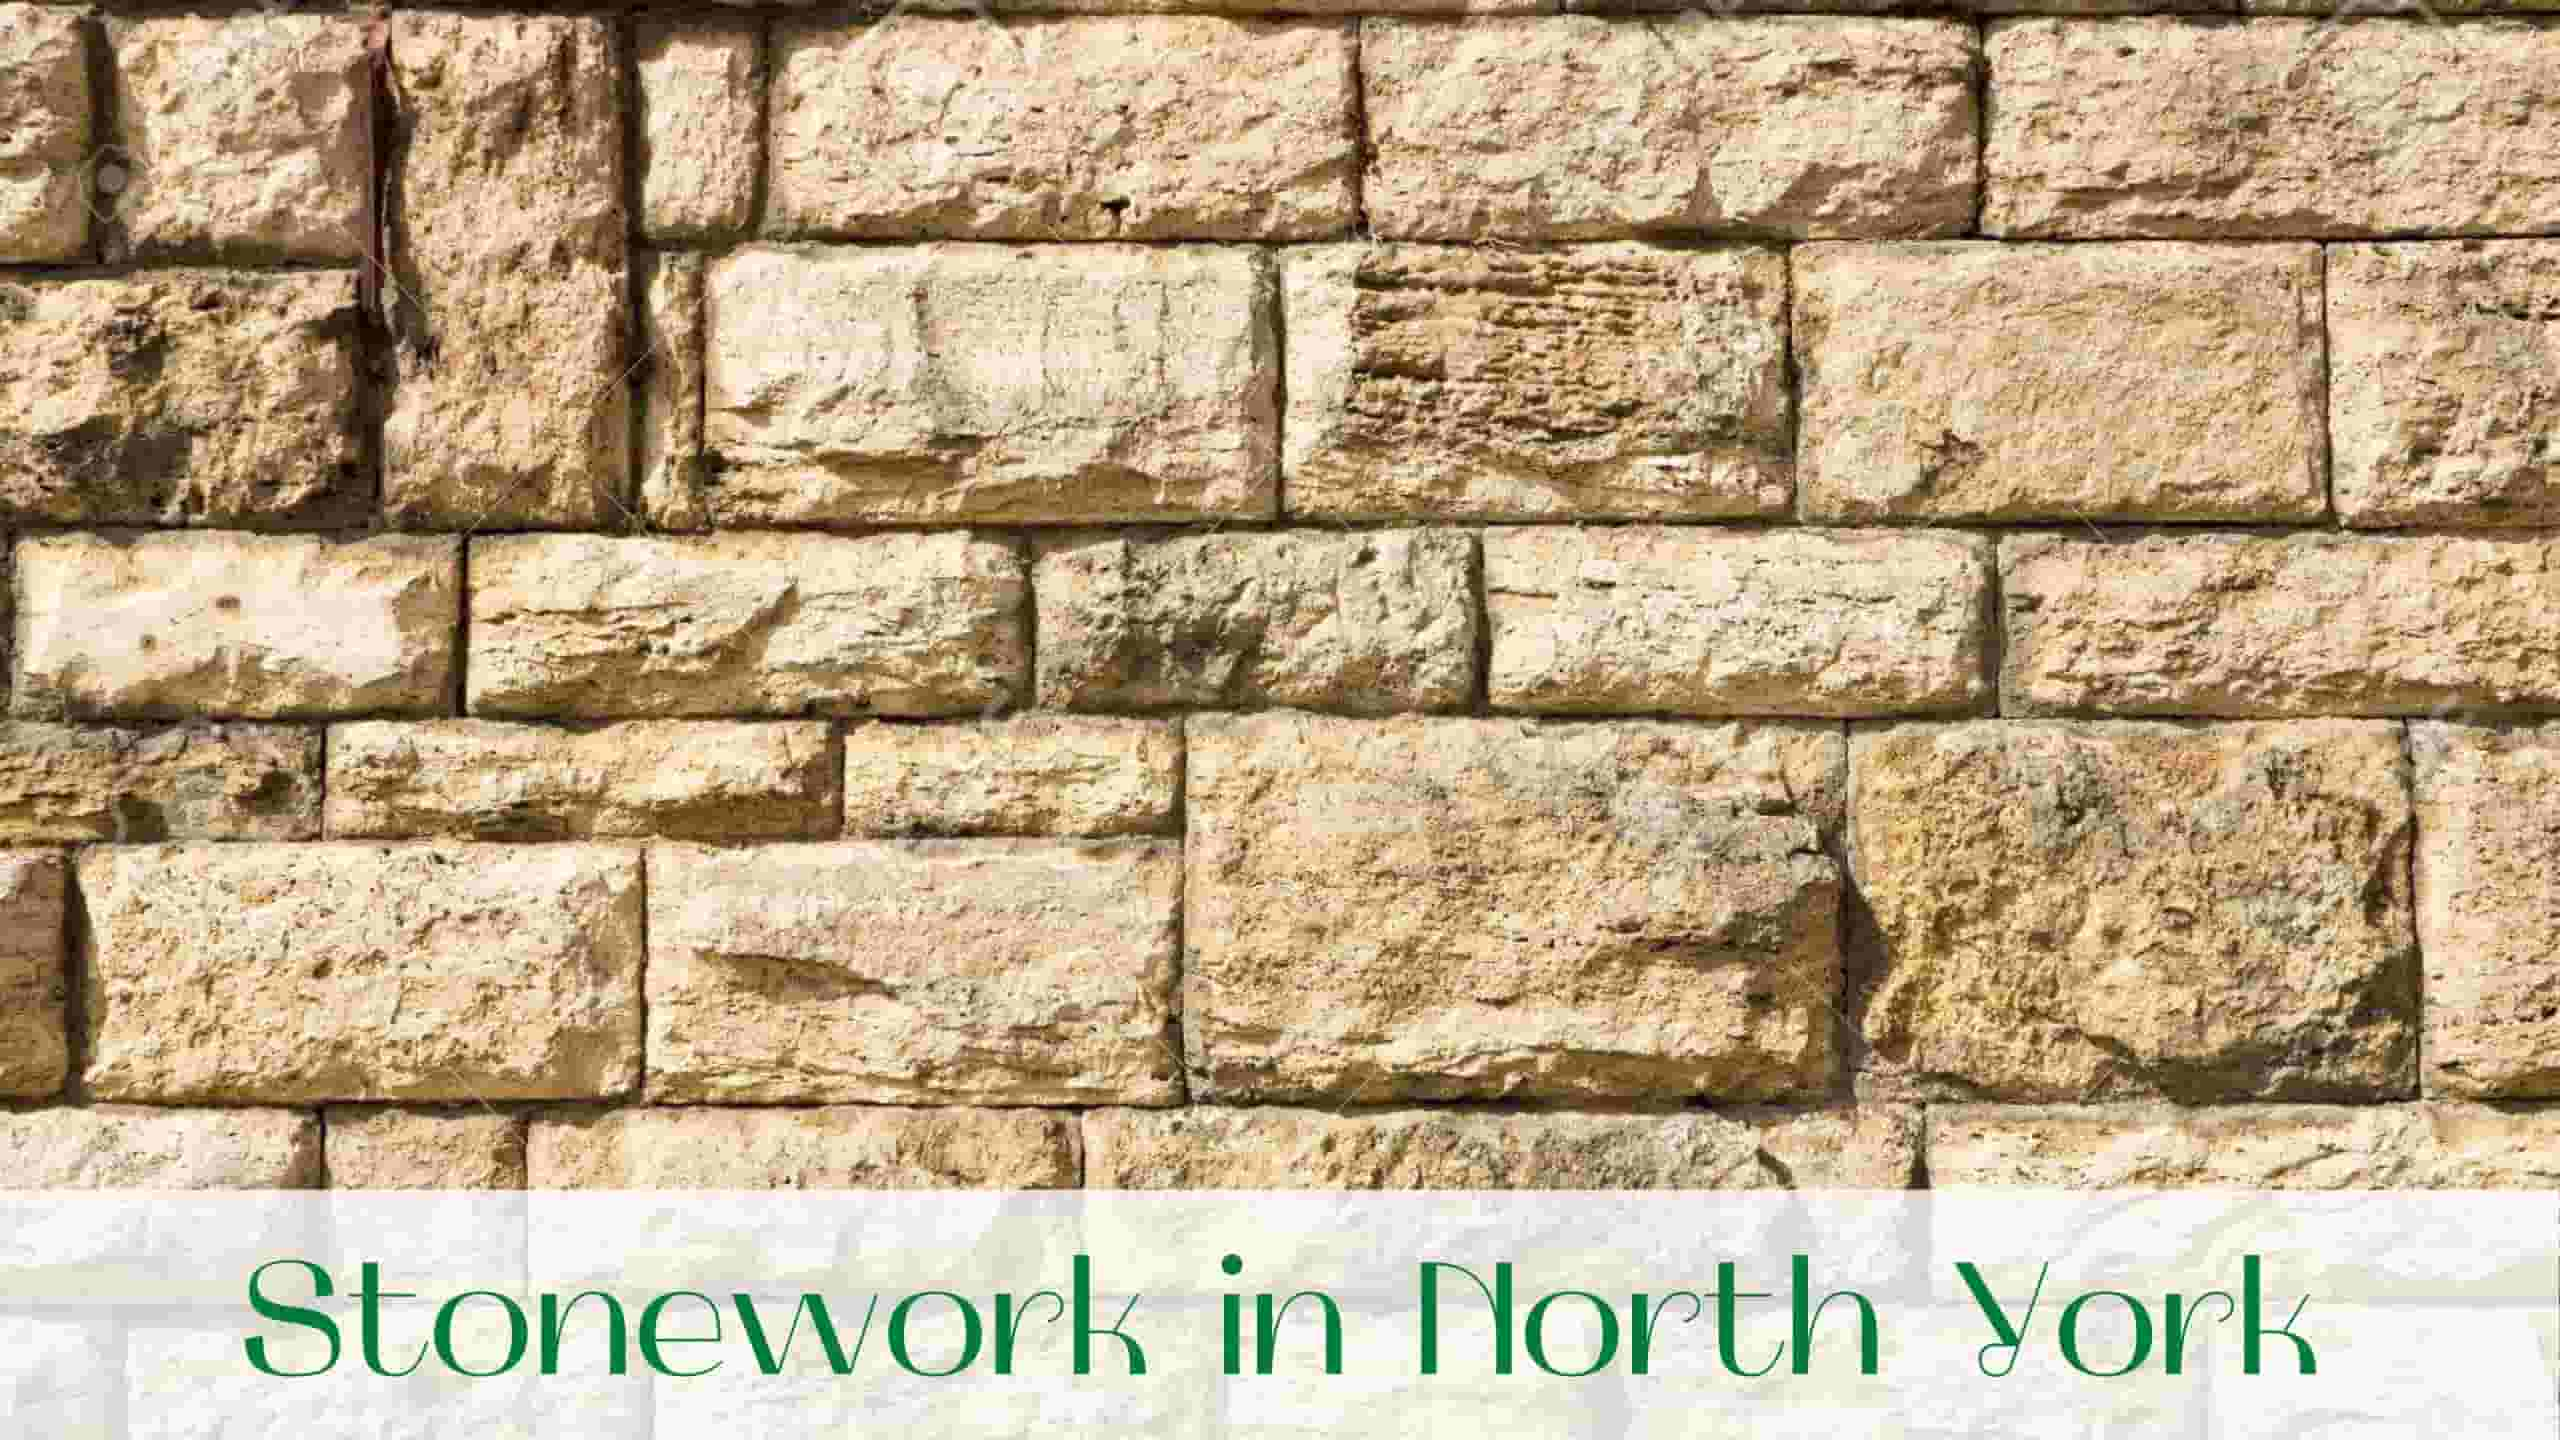 image-stonework-in-north-york